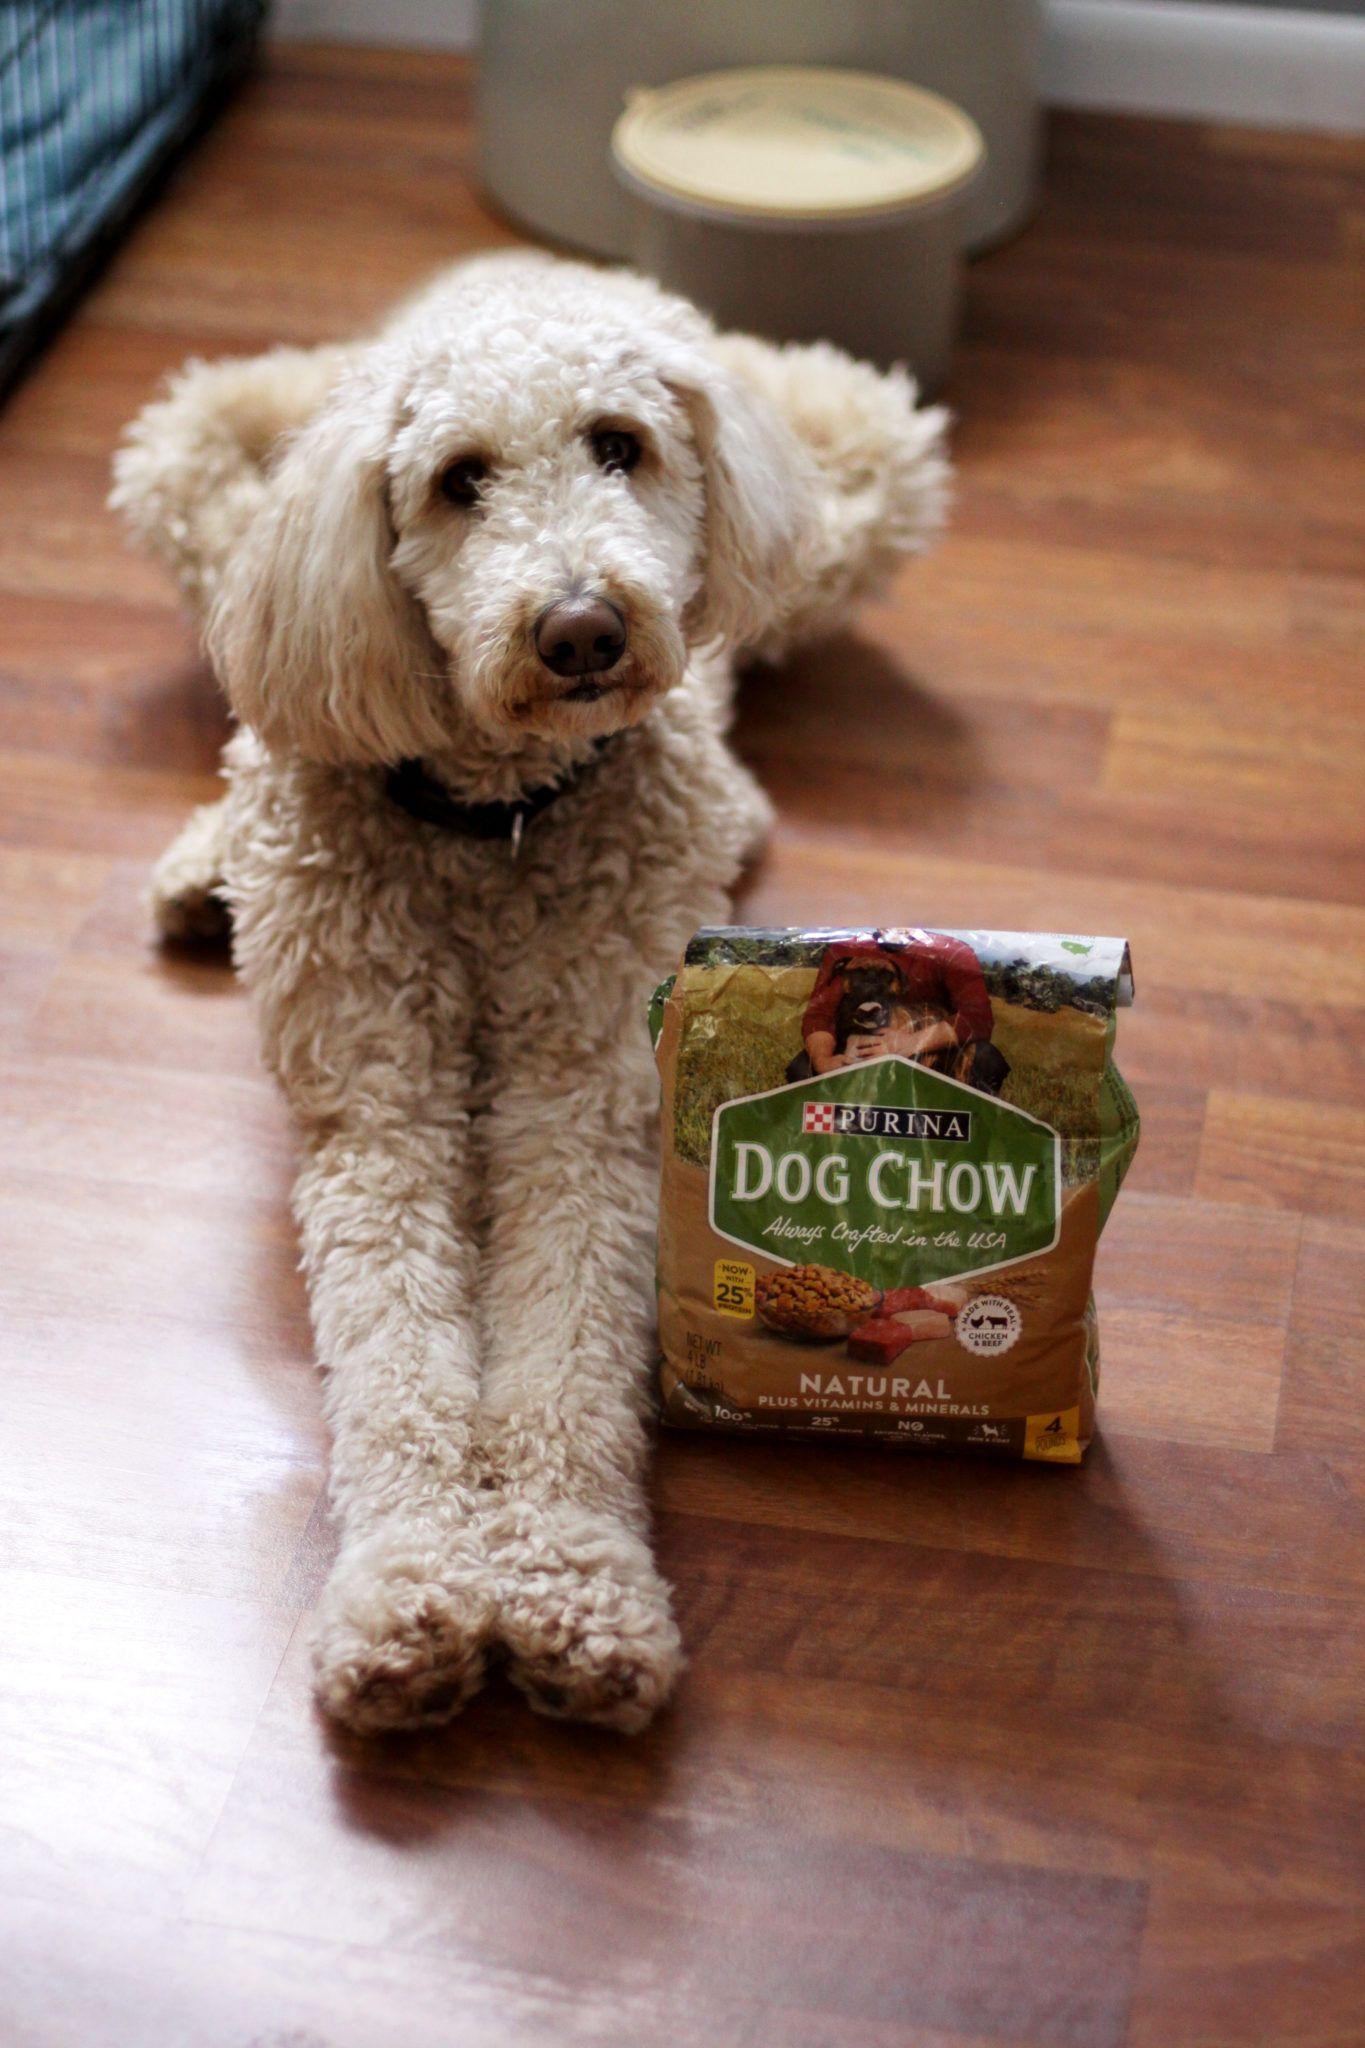 Choosing Quality Dog Food At Meijer Dog Food Recipes Purina Dog